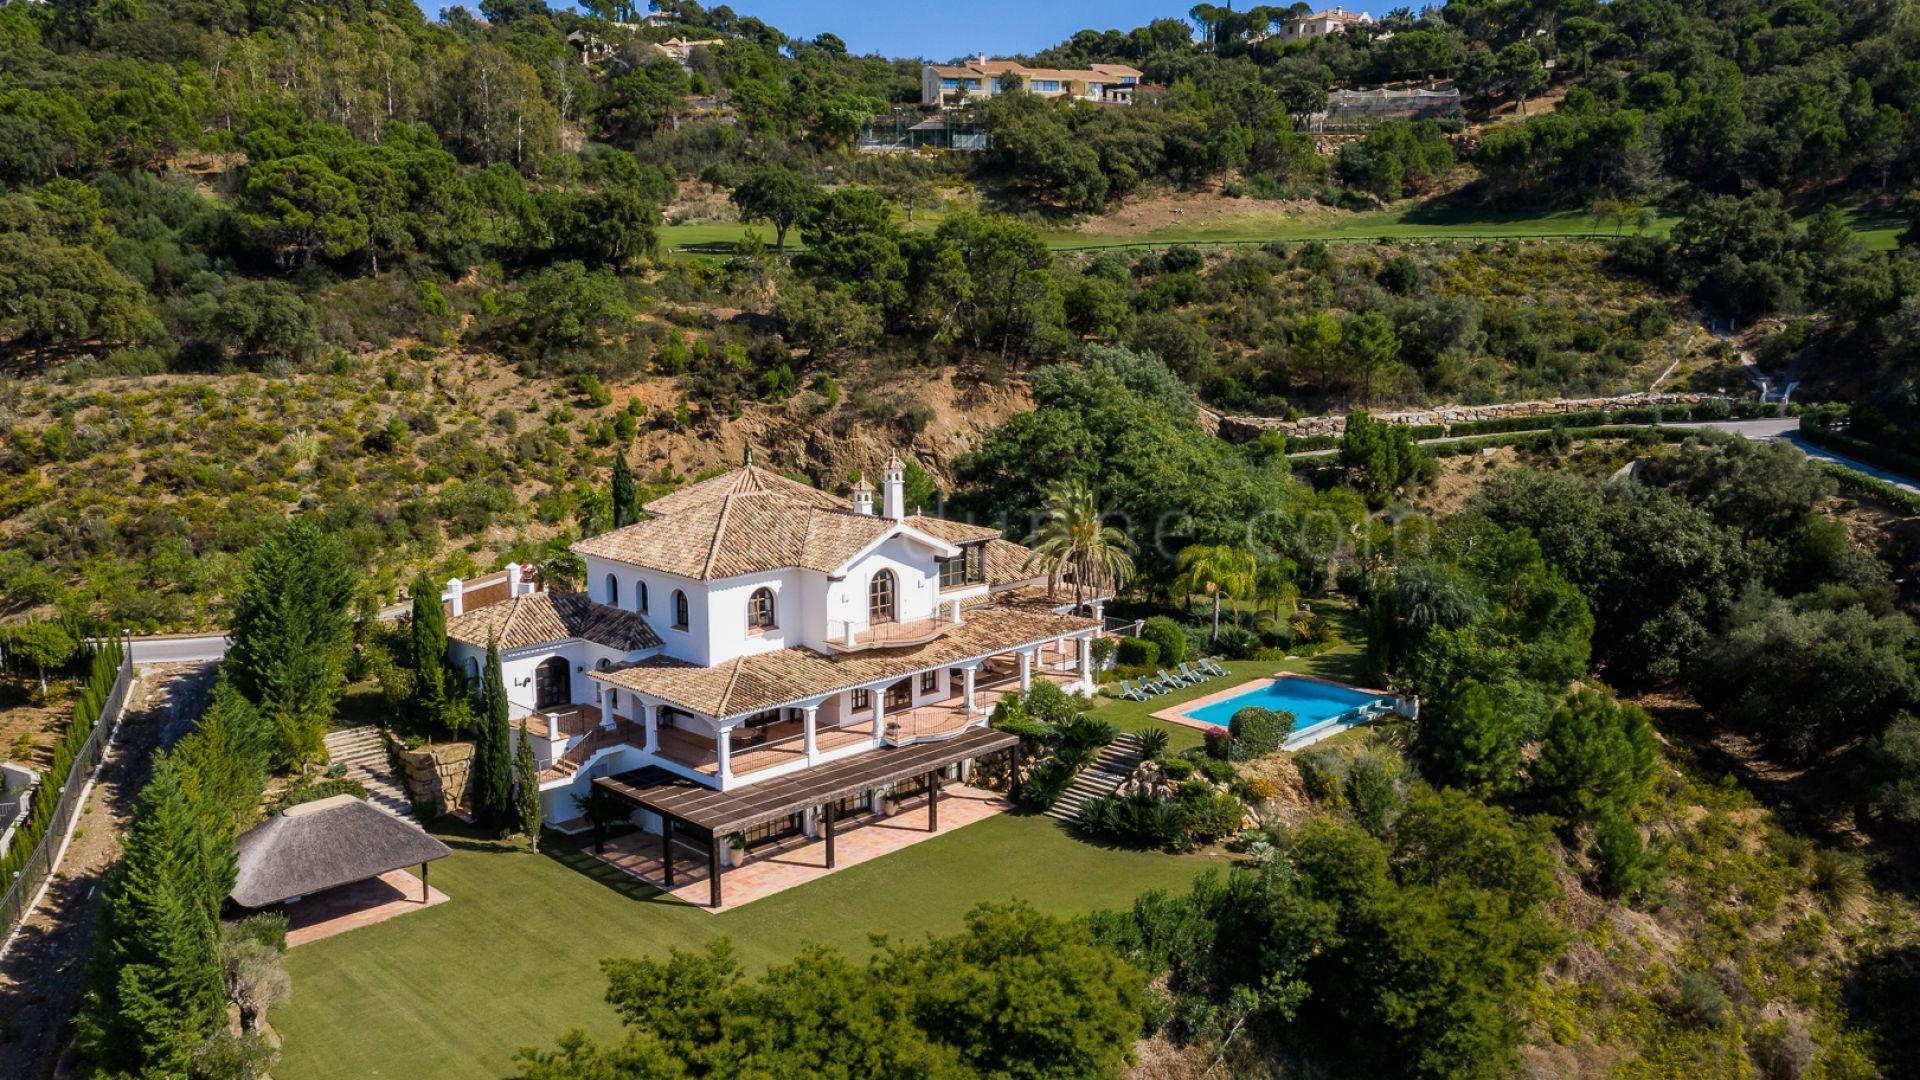 Well Priced Villa For Sale In La Zagaleta Spain